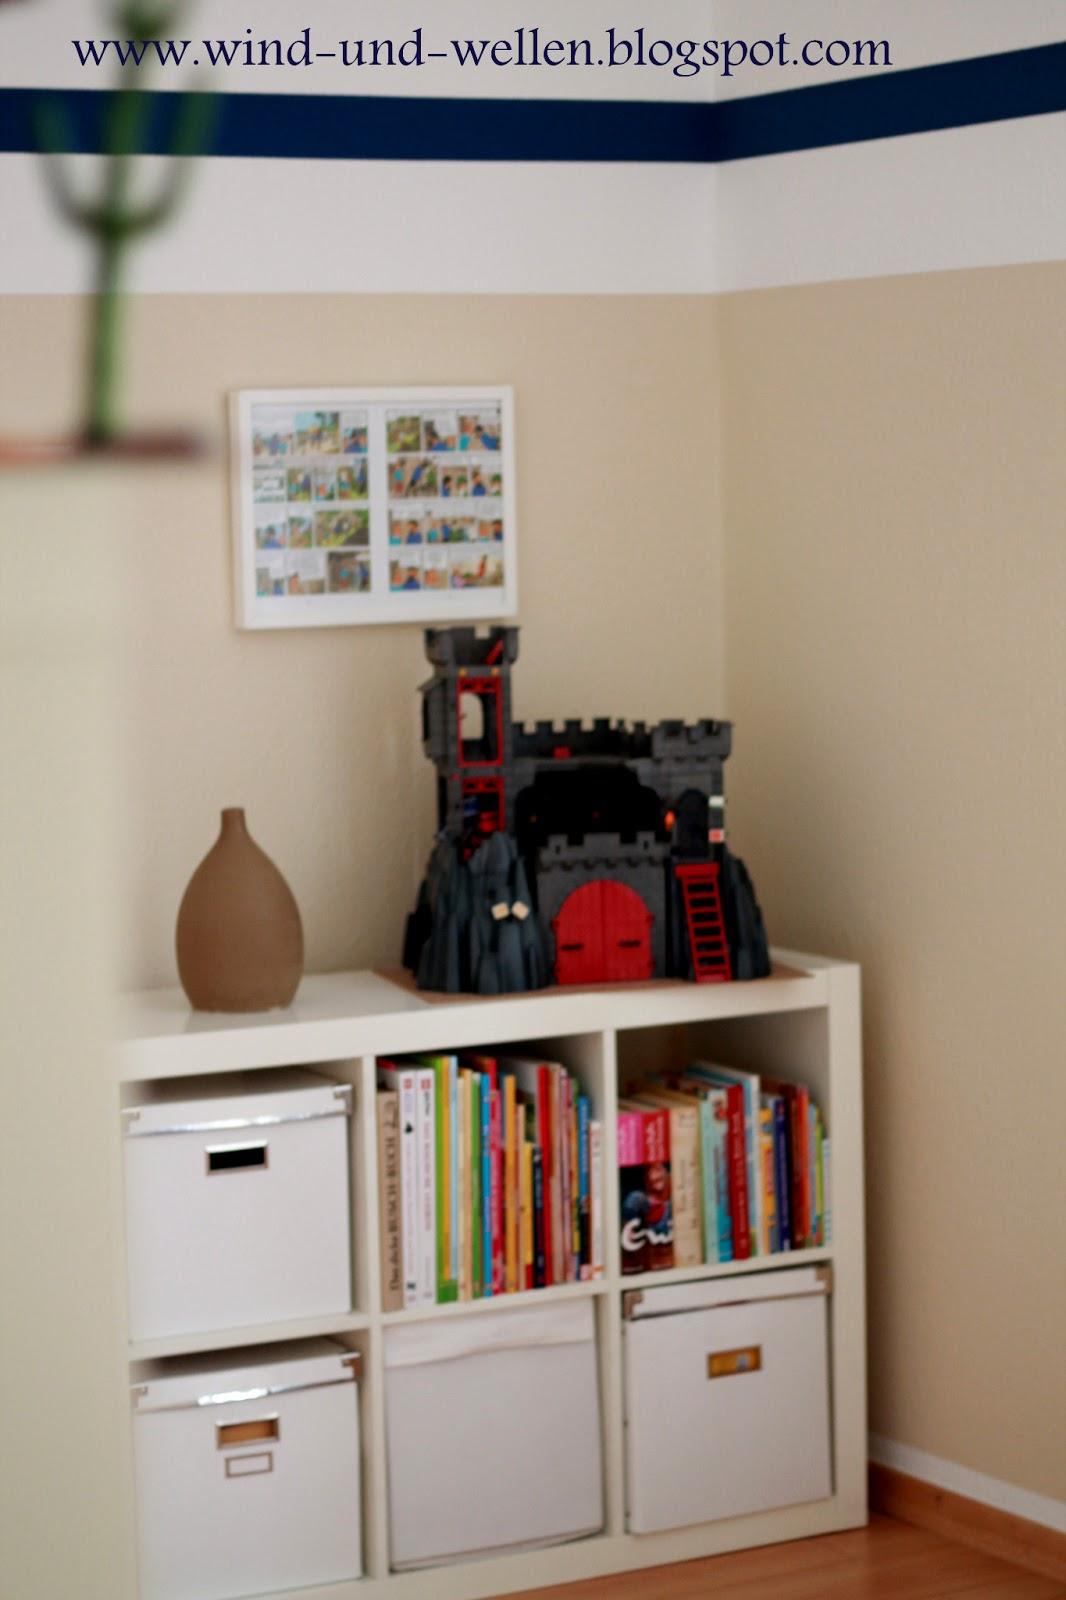 wind und wellen kinderzimmer makeover. Black Bedroom Furniture Sets. Home Design Ideas